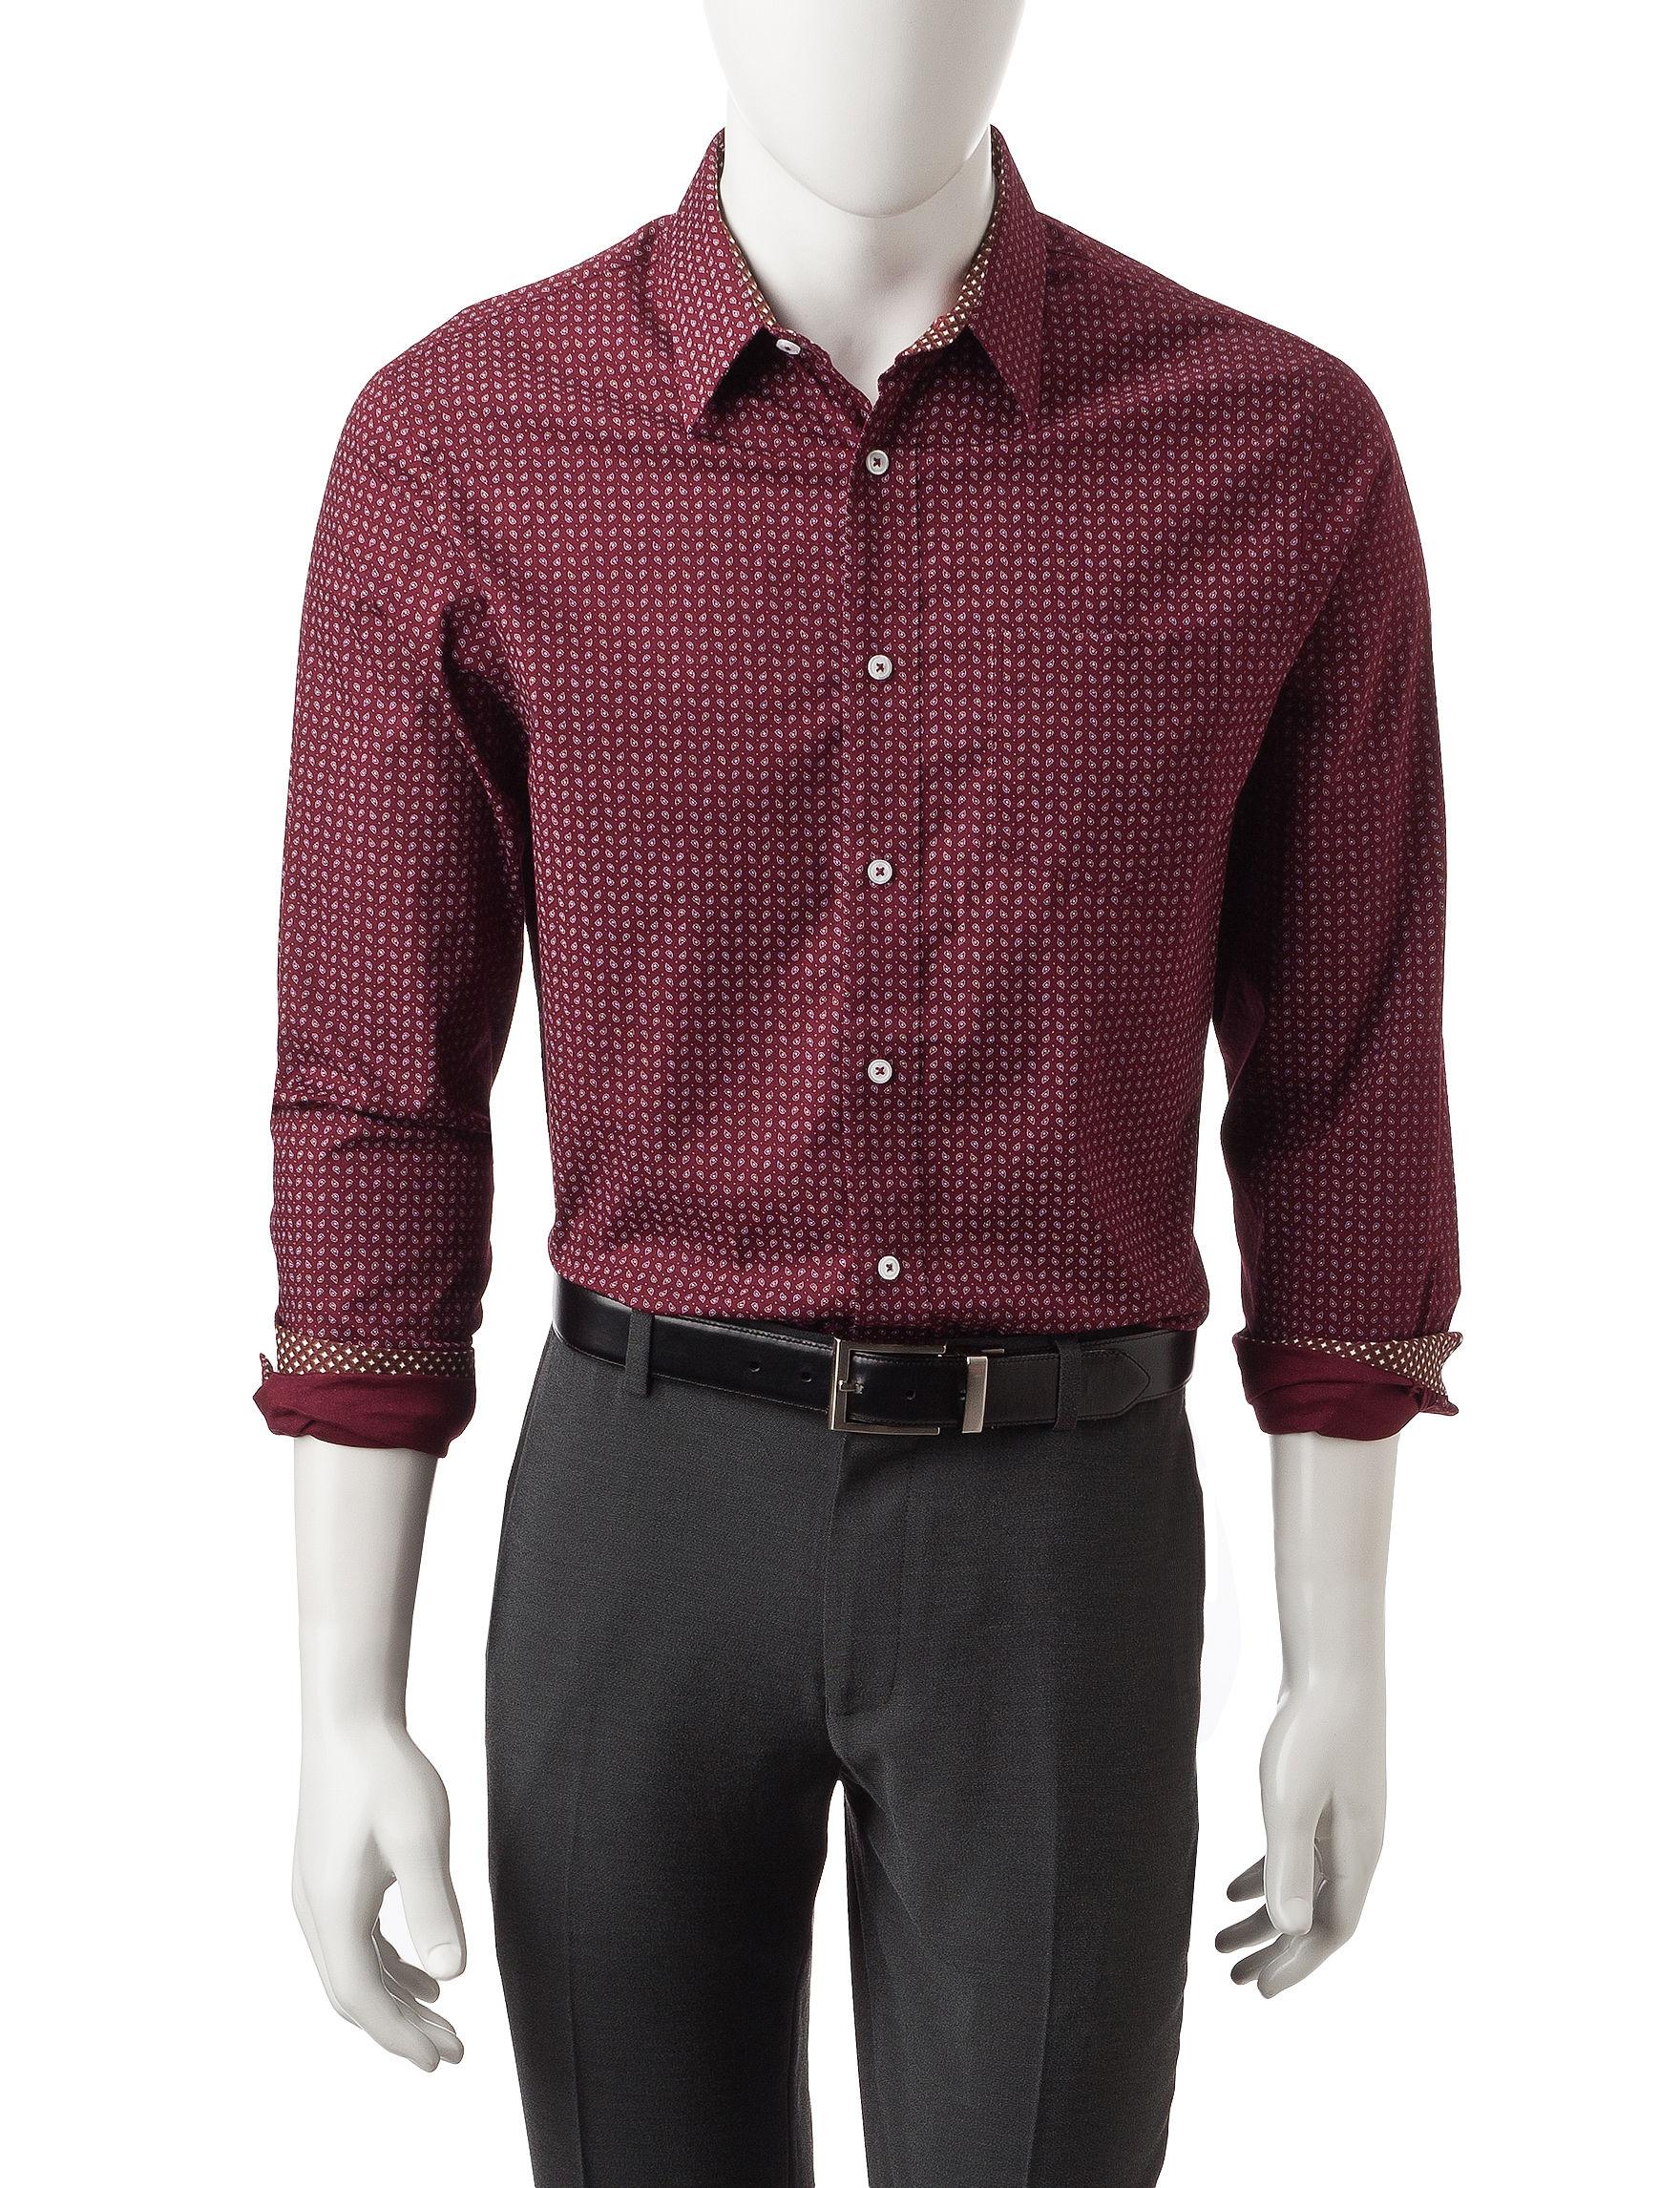 Signature Studio Burgundy Casual Button Down Shirts